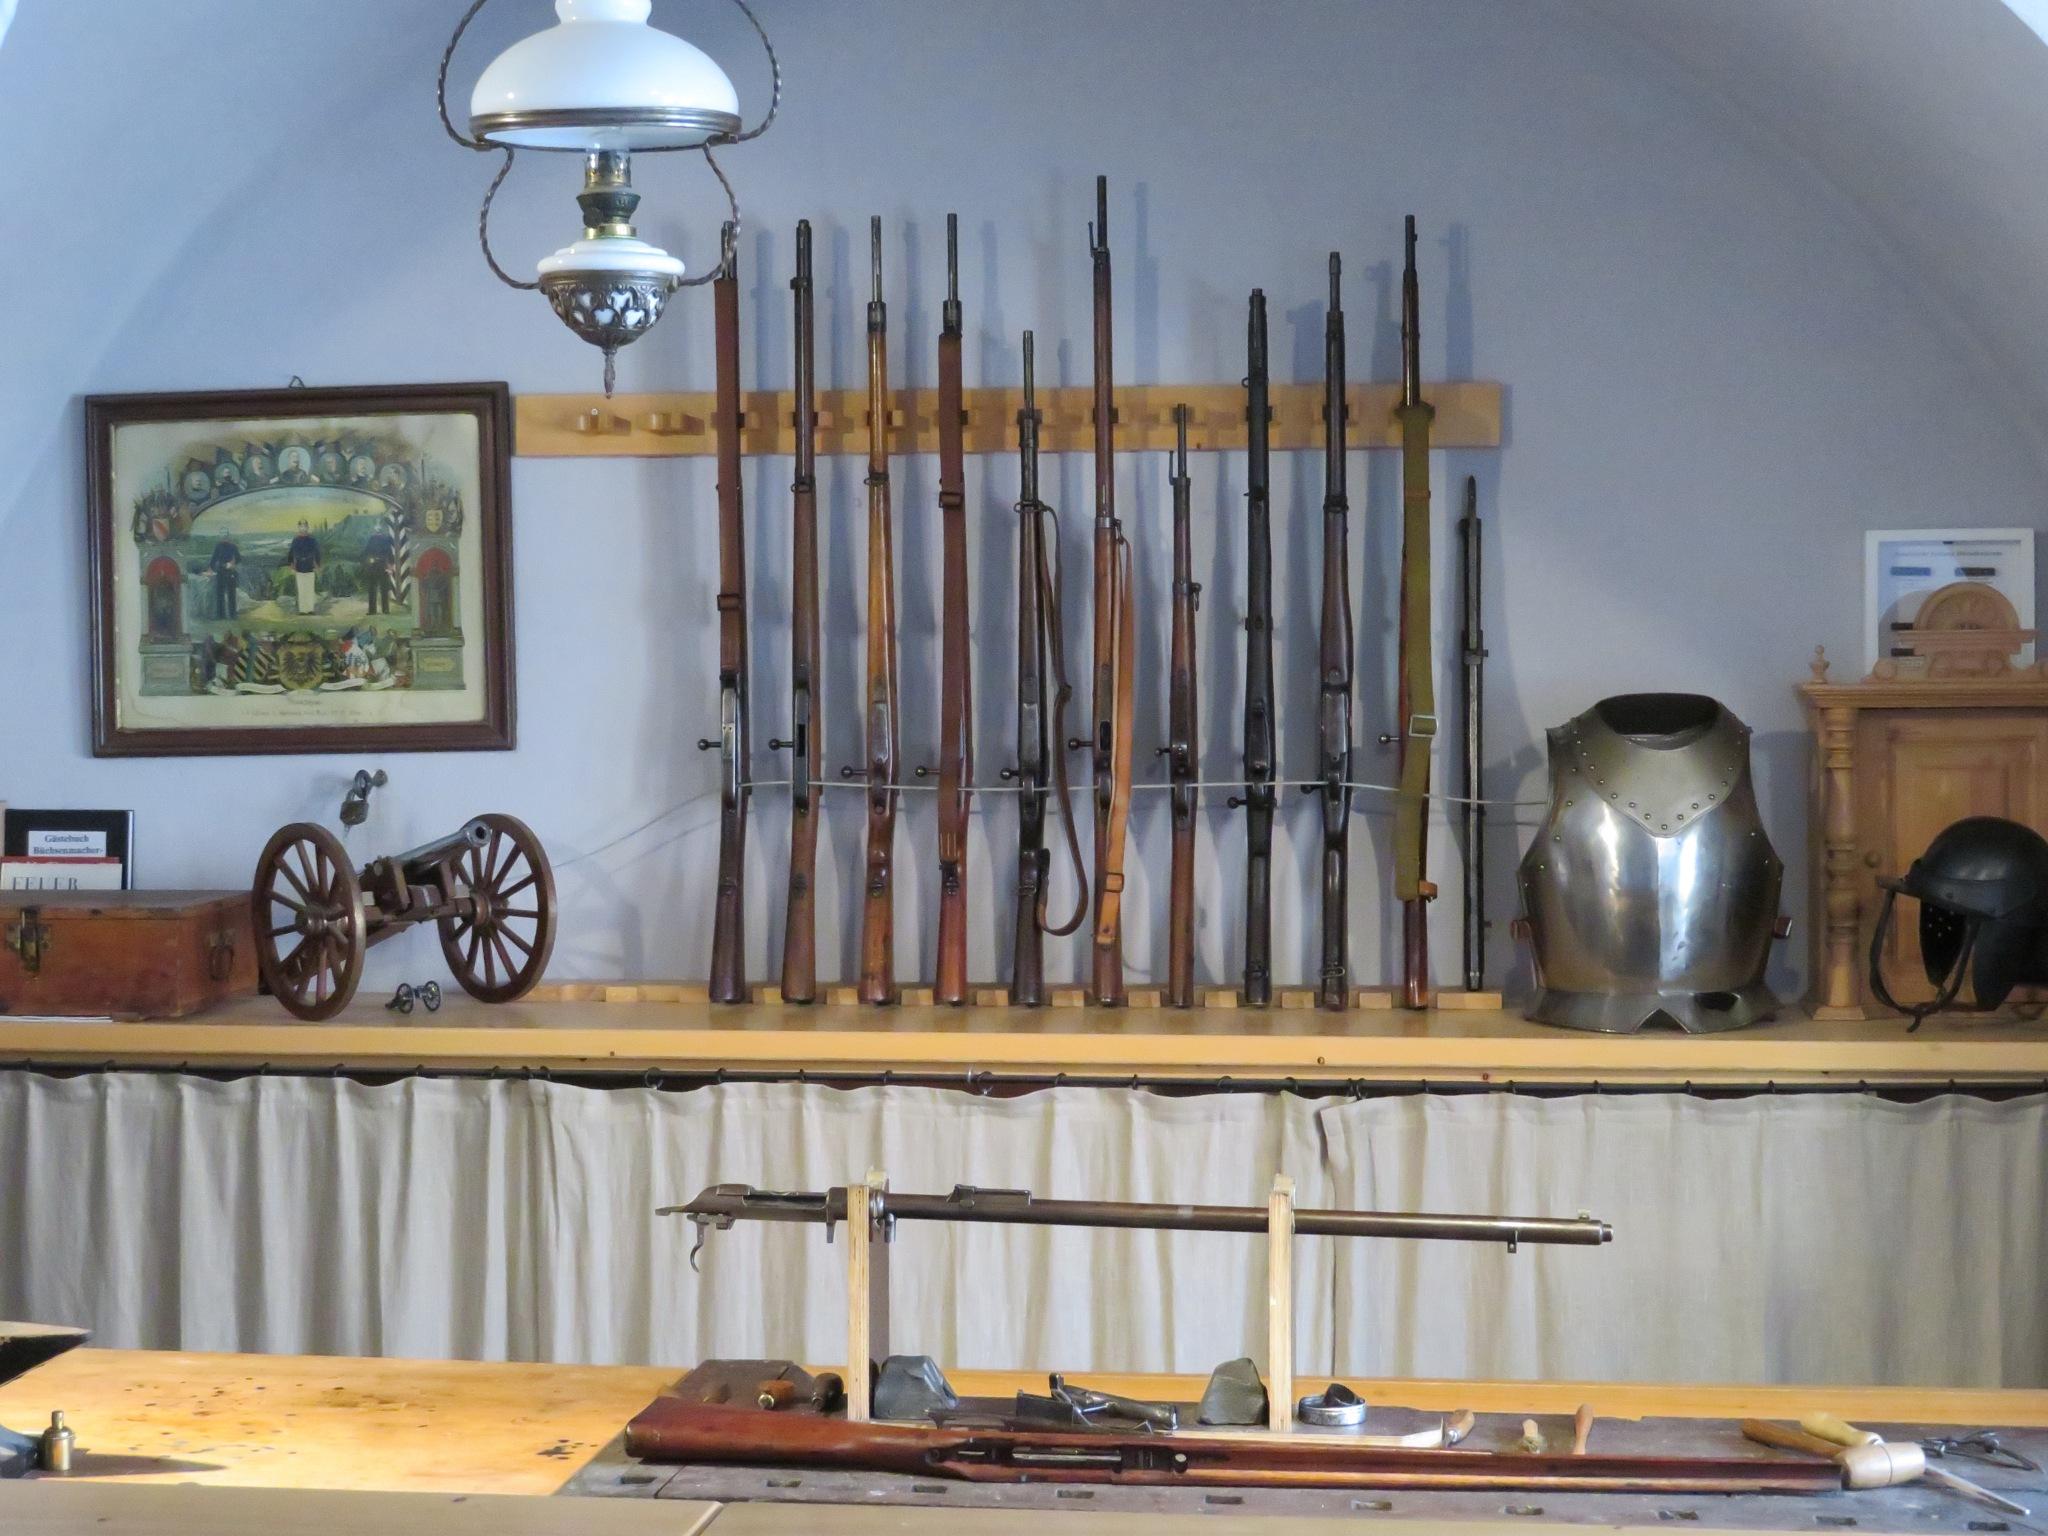 Büchsenmacher / gunsmith by Rolf-Dieter Balindt